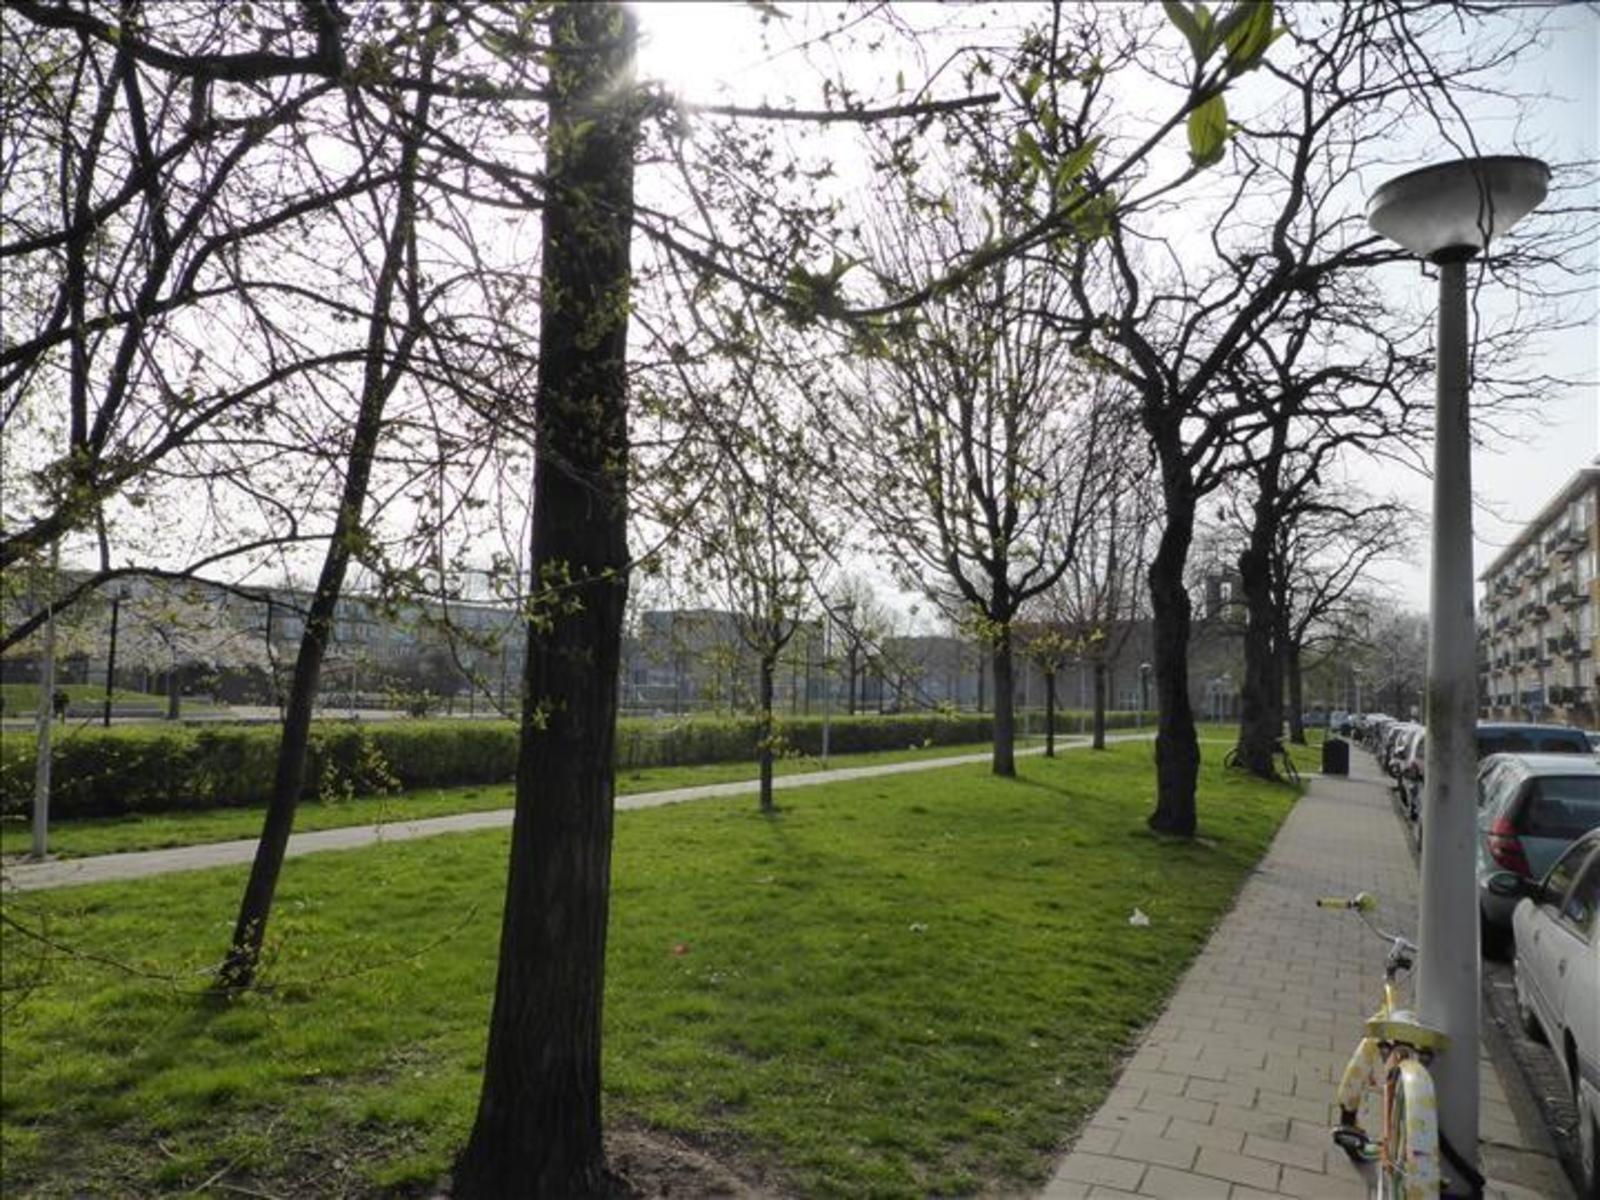 Egidiusstraat 85H, Amsterdam